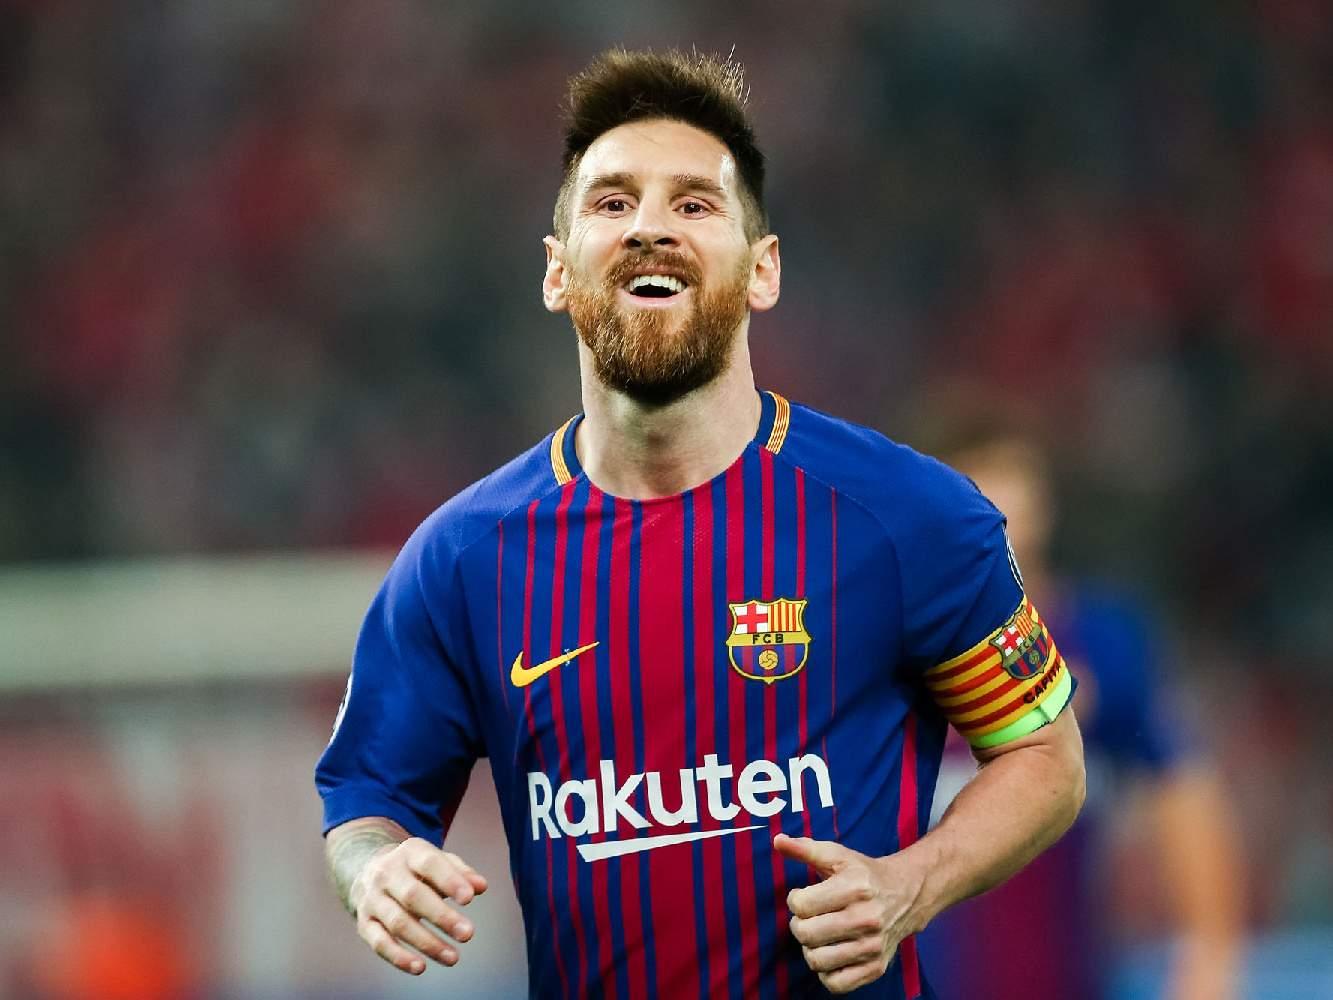 Куман: «Месси нужен «Барселоне», чтобы бороться за трофеи»